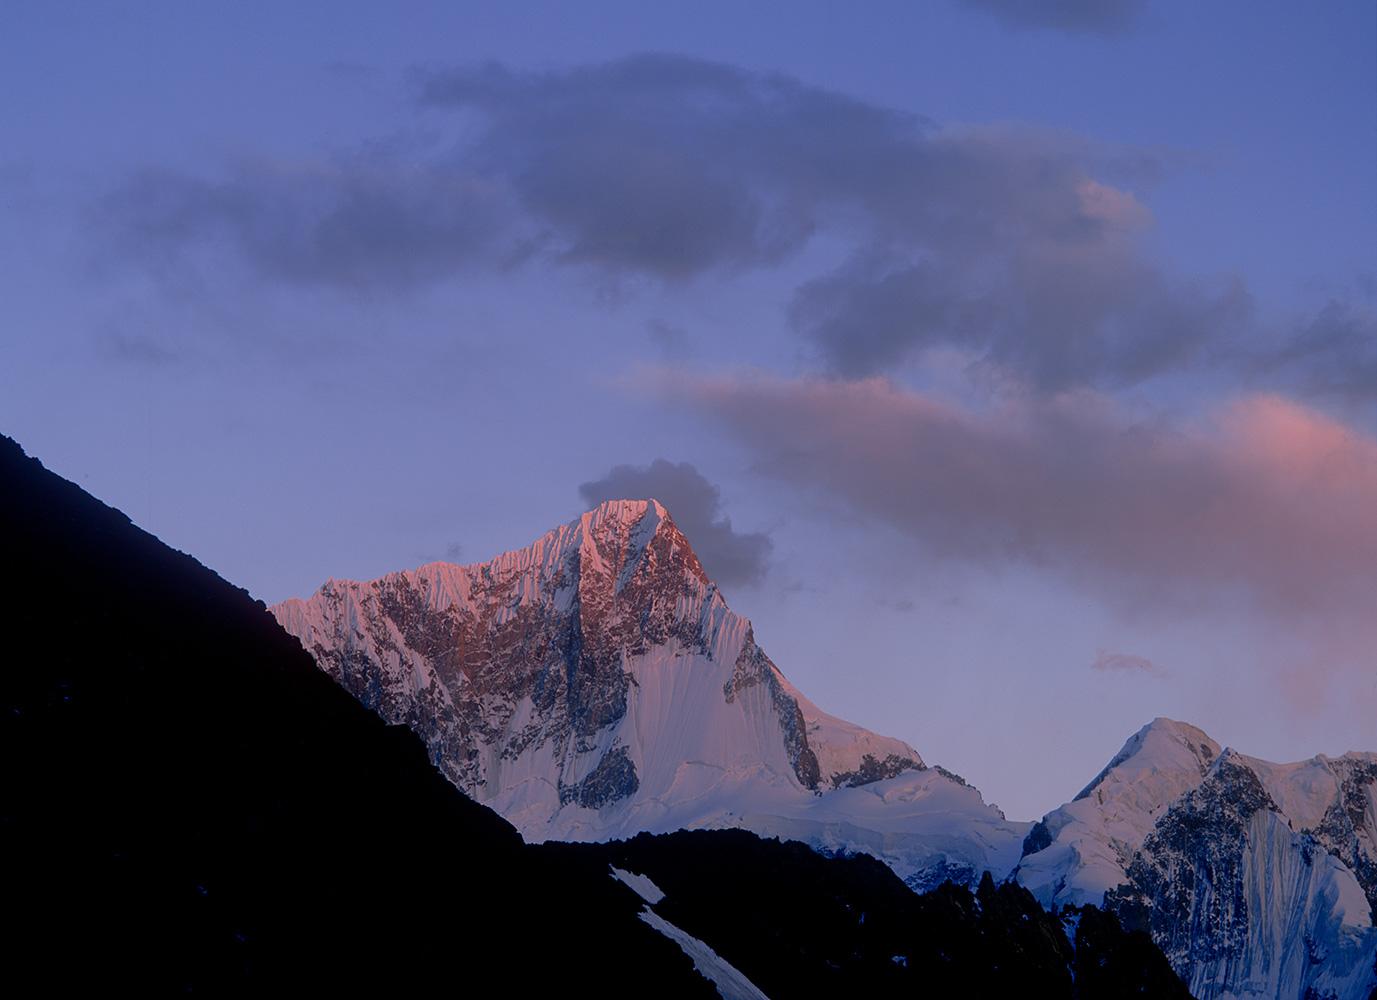 Telephoto from above Ishkarwarz at dusk in the upper Yarkhun Valley, ChitralBronica ETRSi, Vuji Velvia